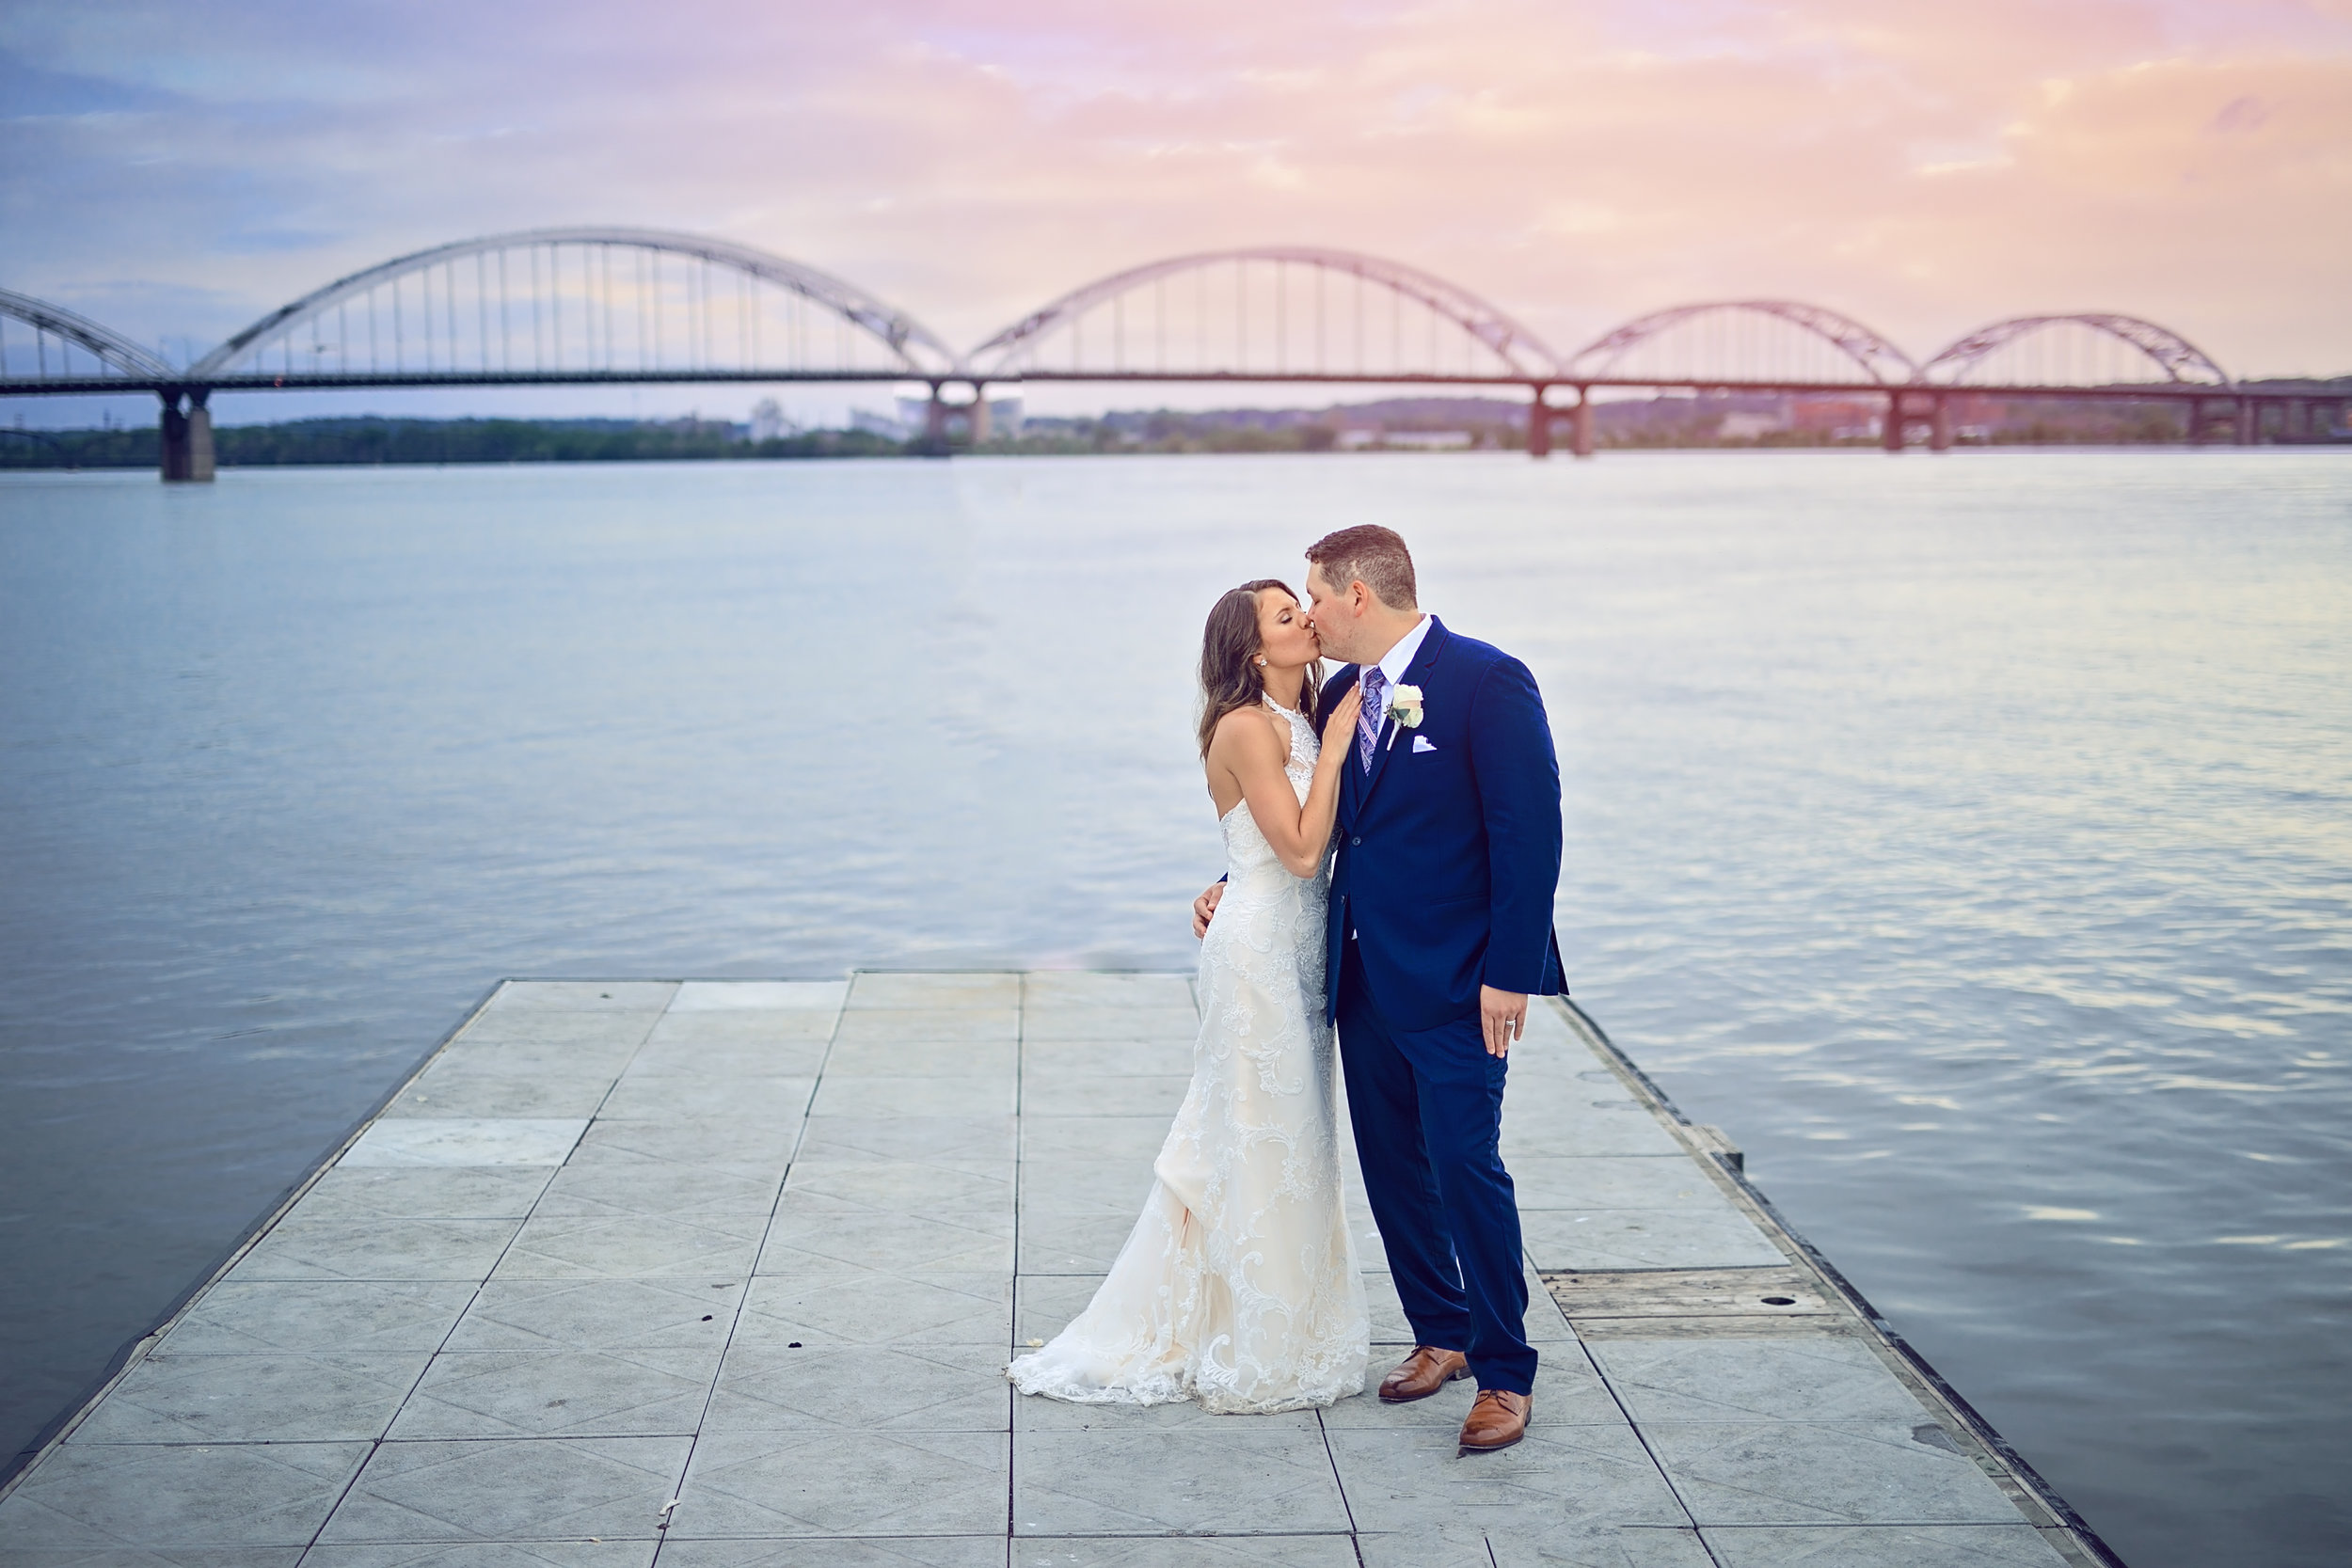 Schweibert-park-in-rock-island-stunning-quad-cities-wedding.jpg